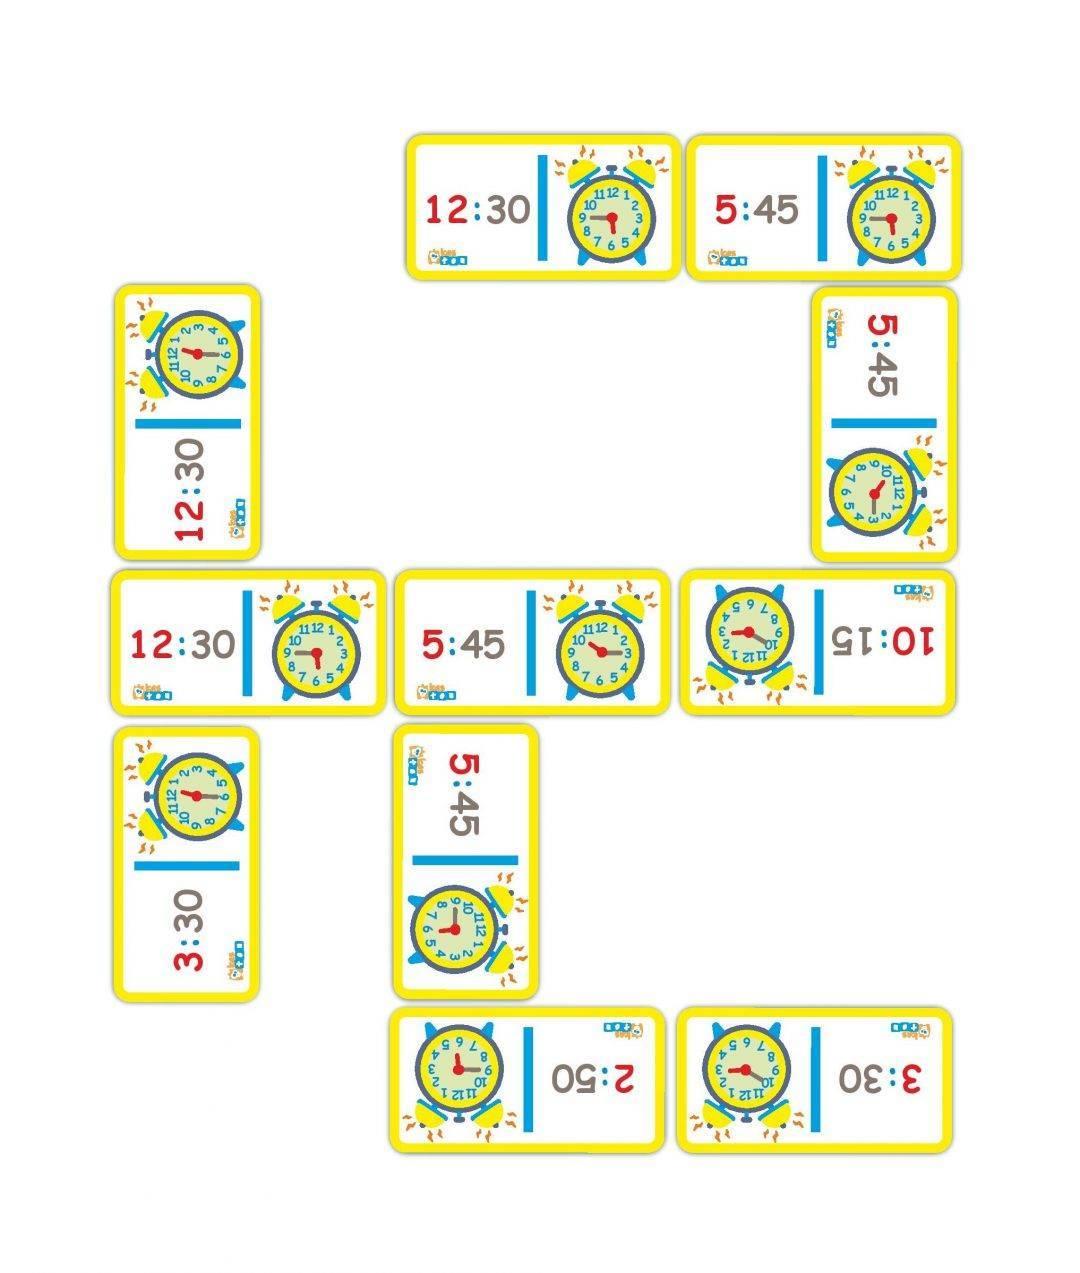 domino-laikrodis-foto